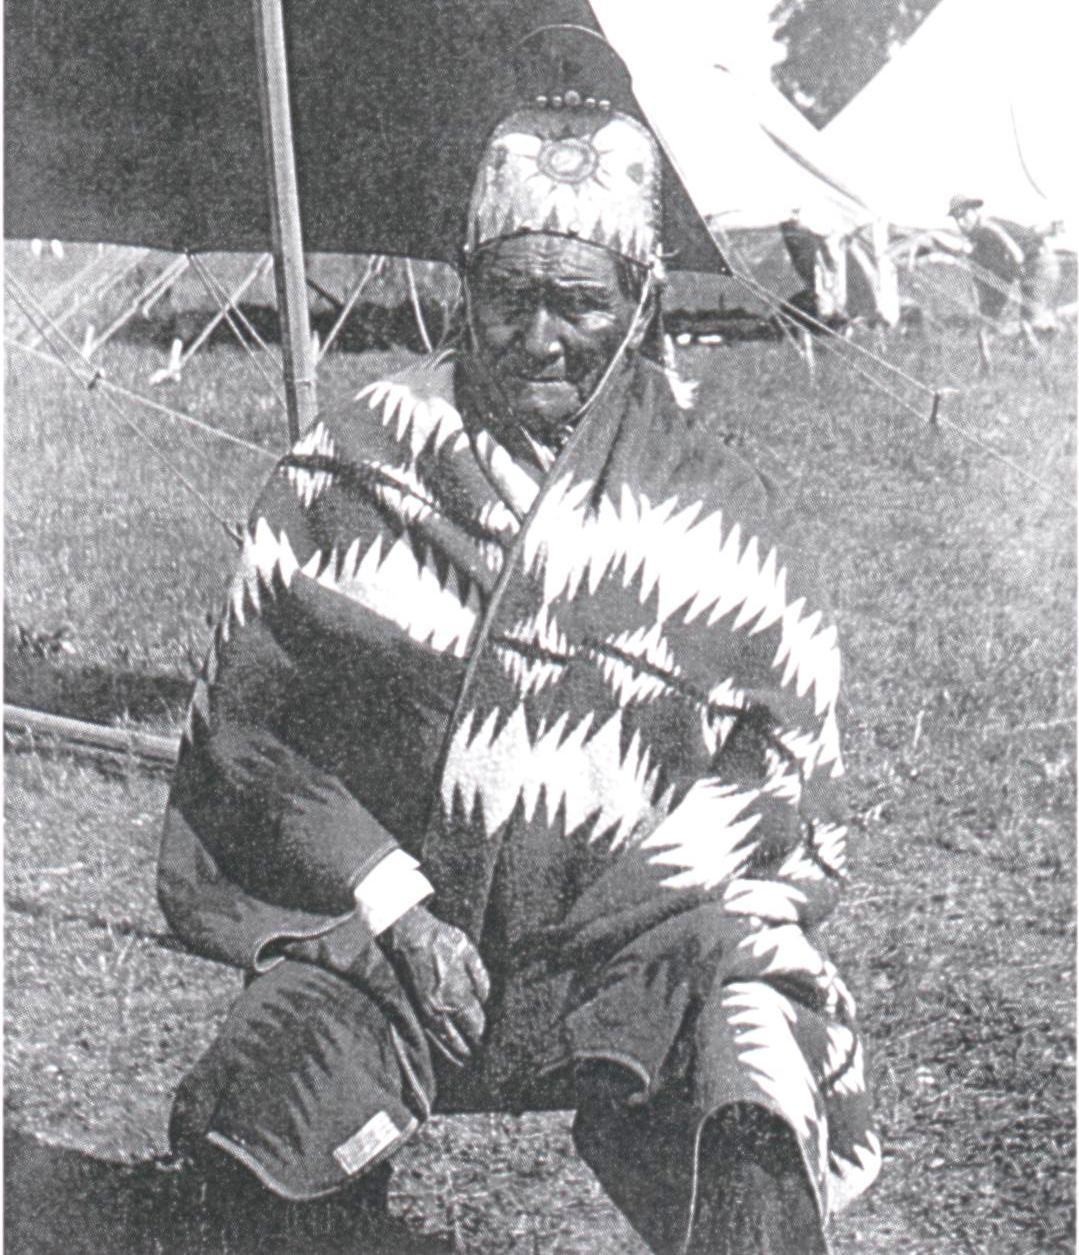 geronimo_wearing_a_pendleton_blanket_1909_courtesy_of_barry_friedman